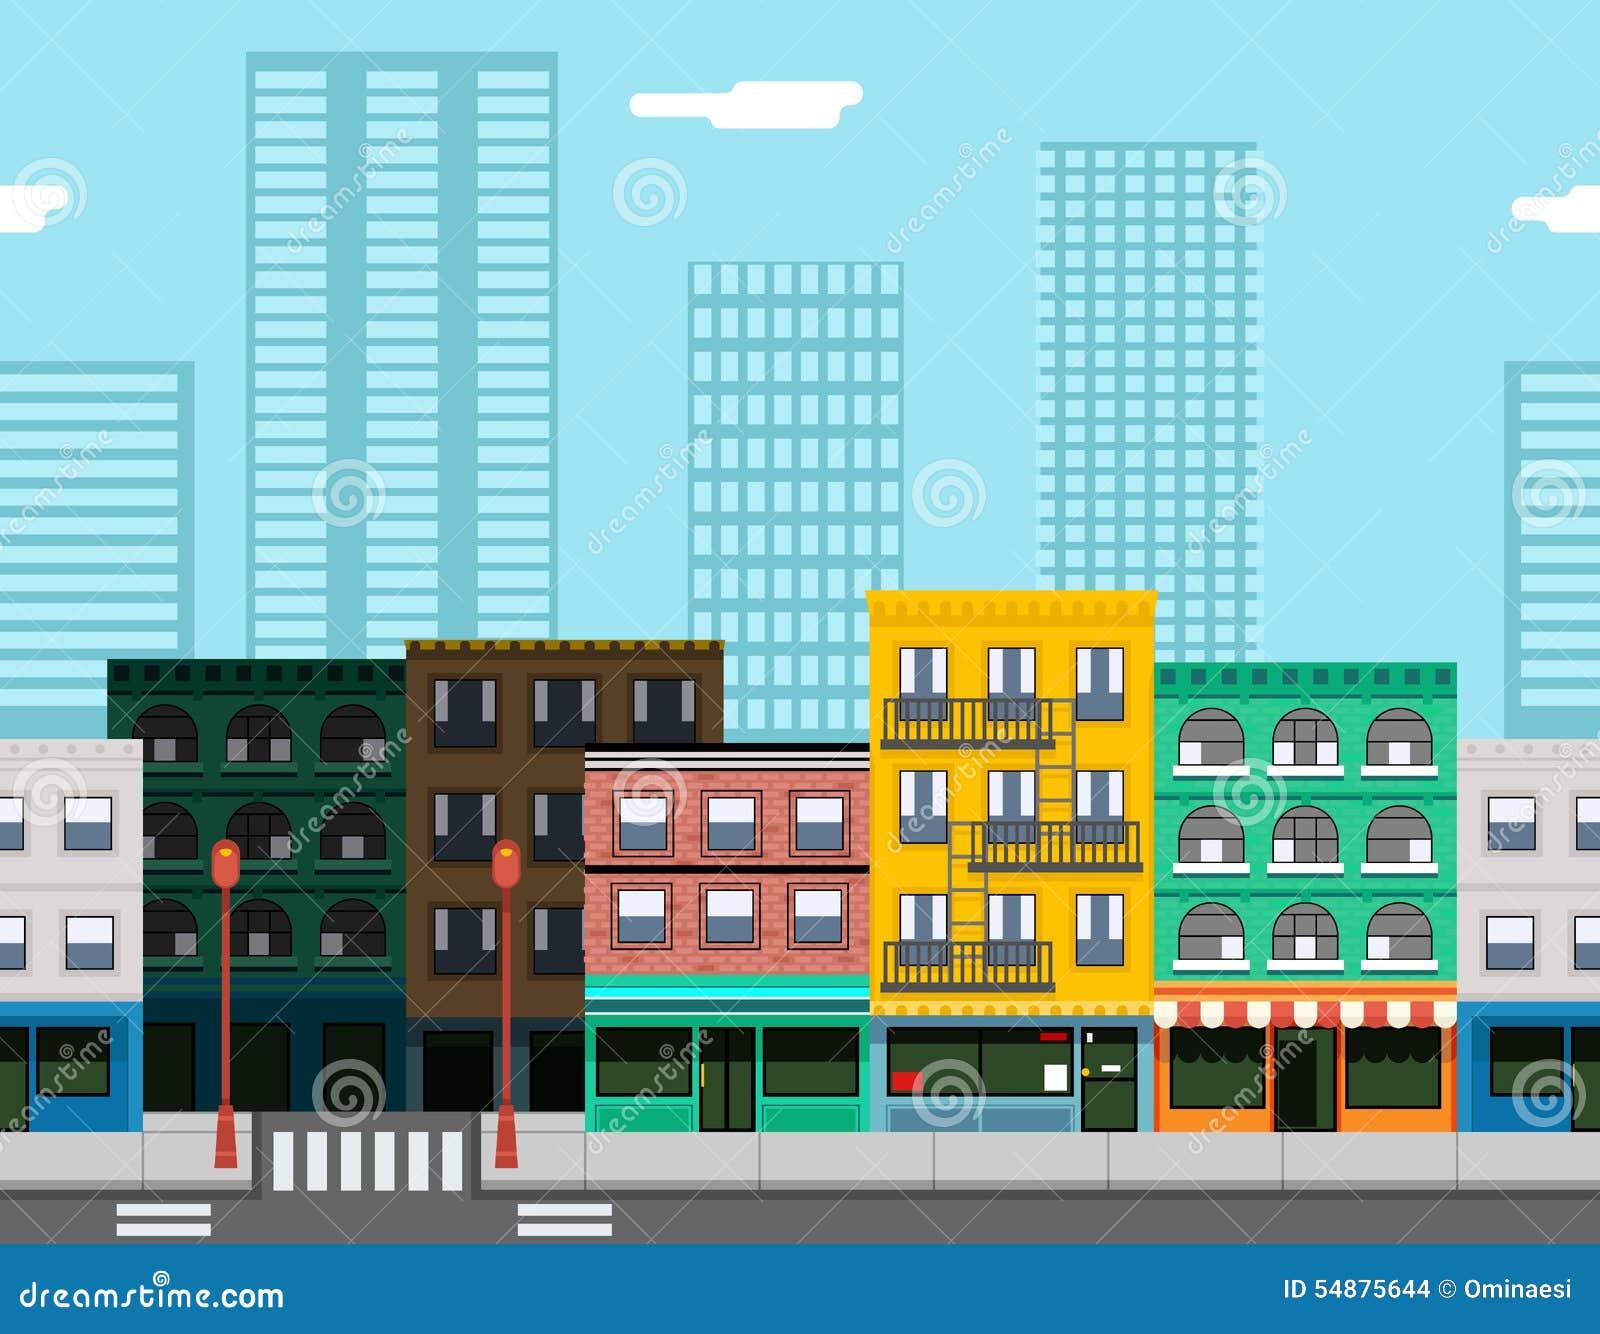 Town Landscape Vector Illustration: Seamless City Street Concept Flat Design Town Stock Vector